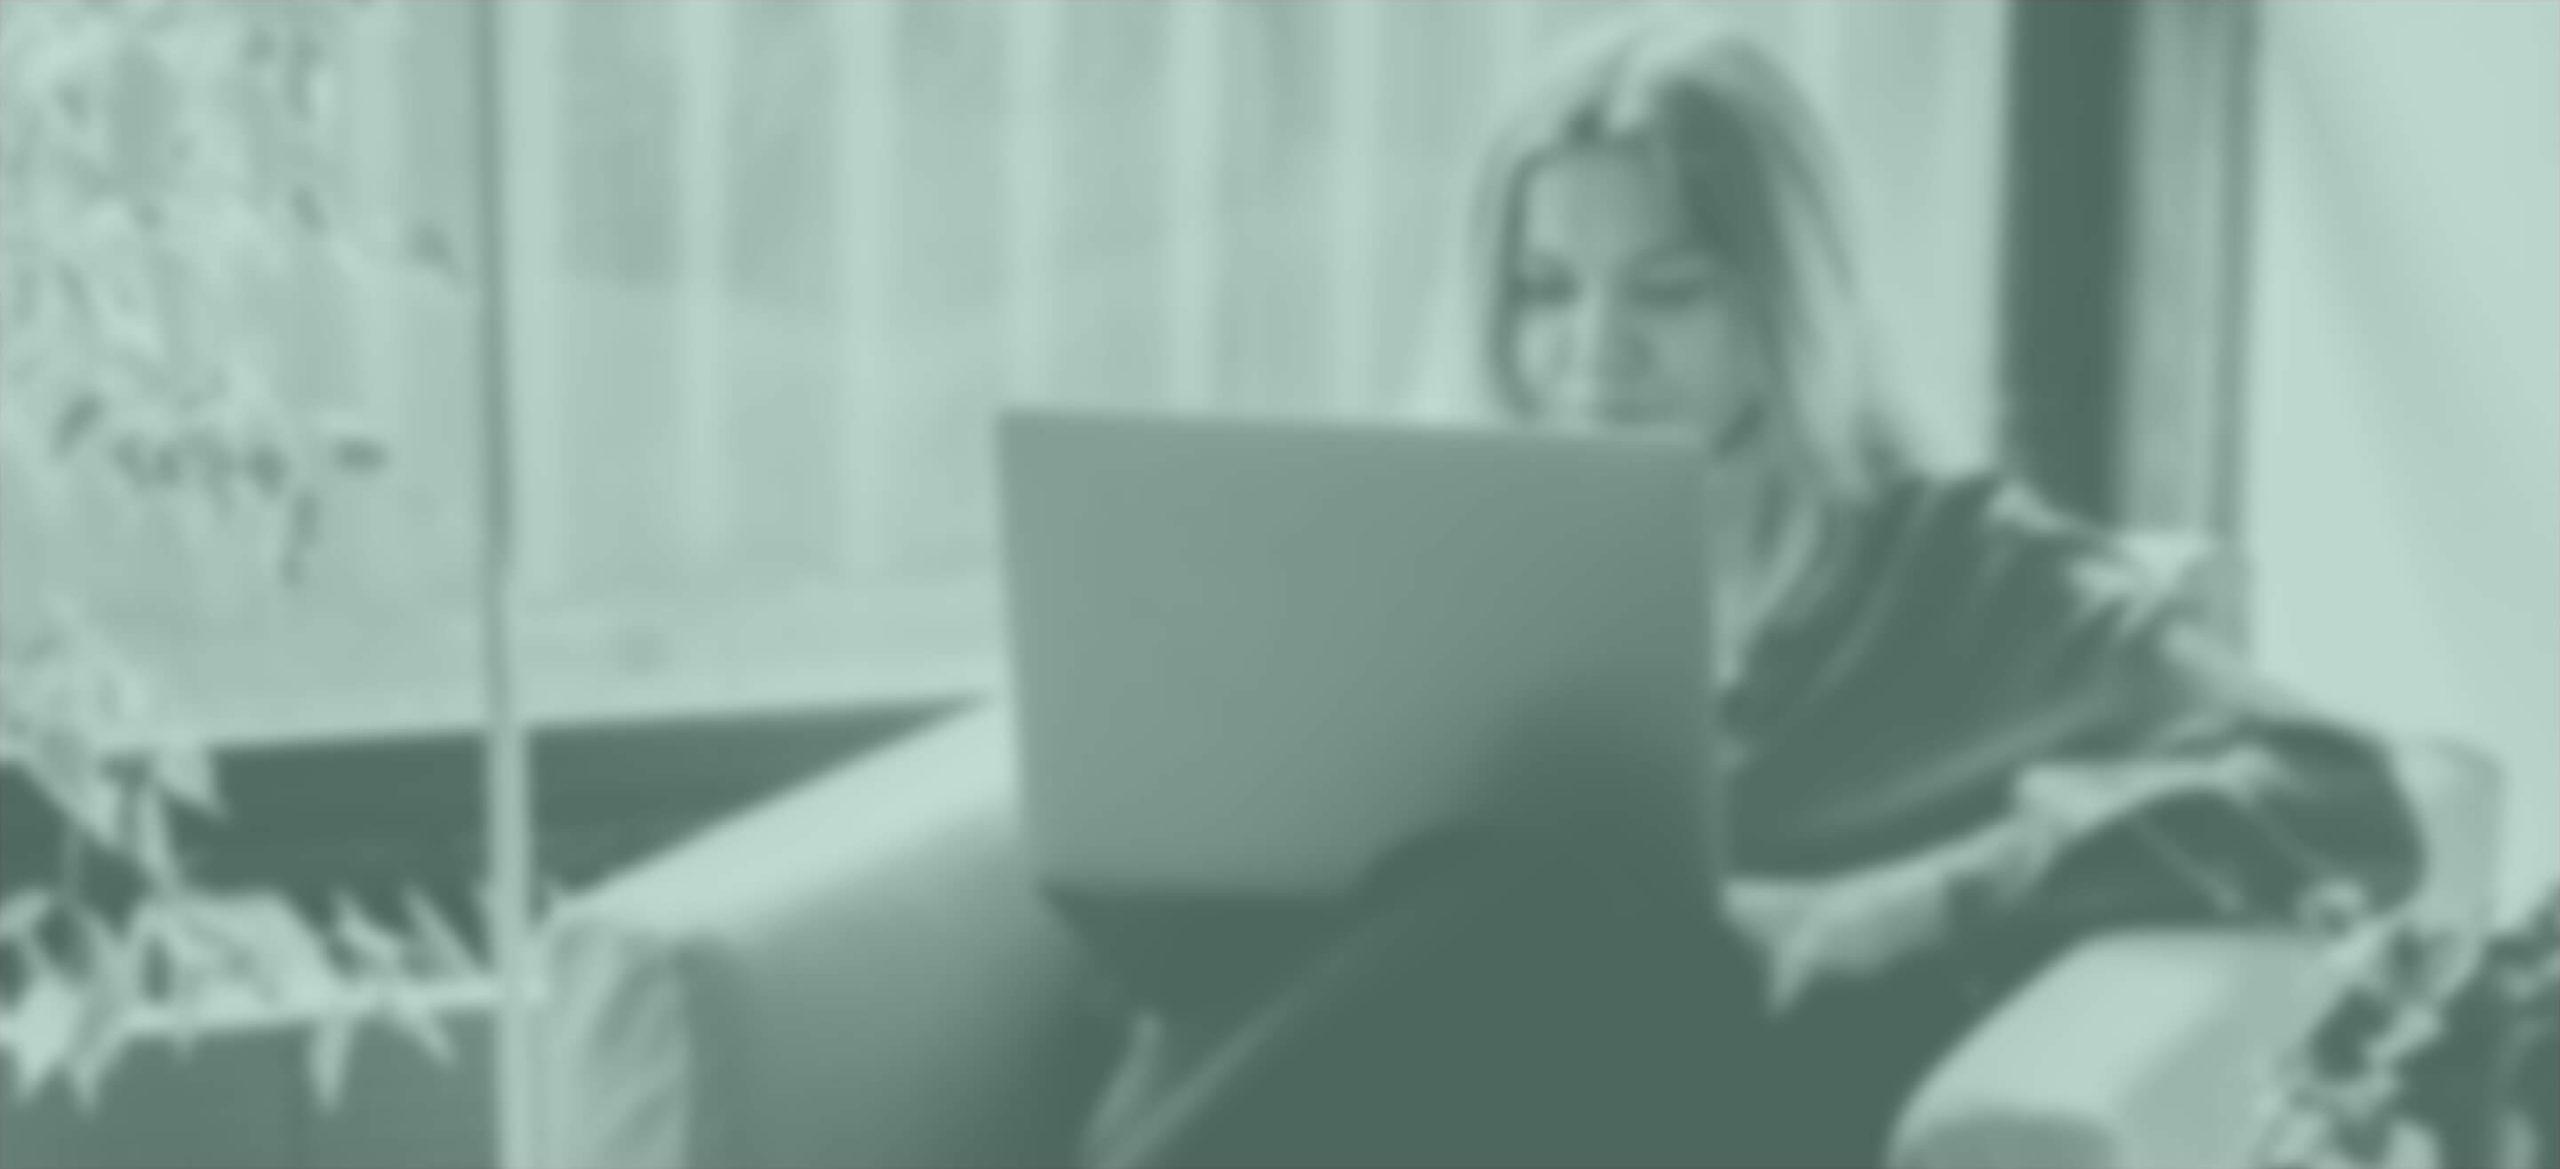 Chica con ordenador portátil para consulta con psicólogo online